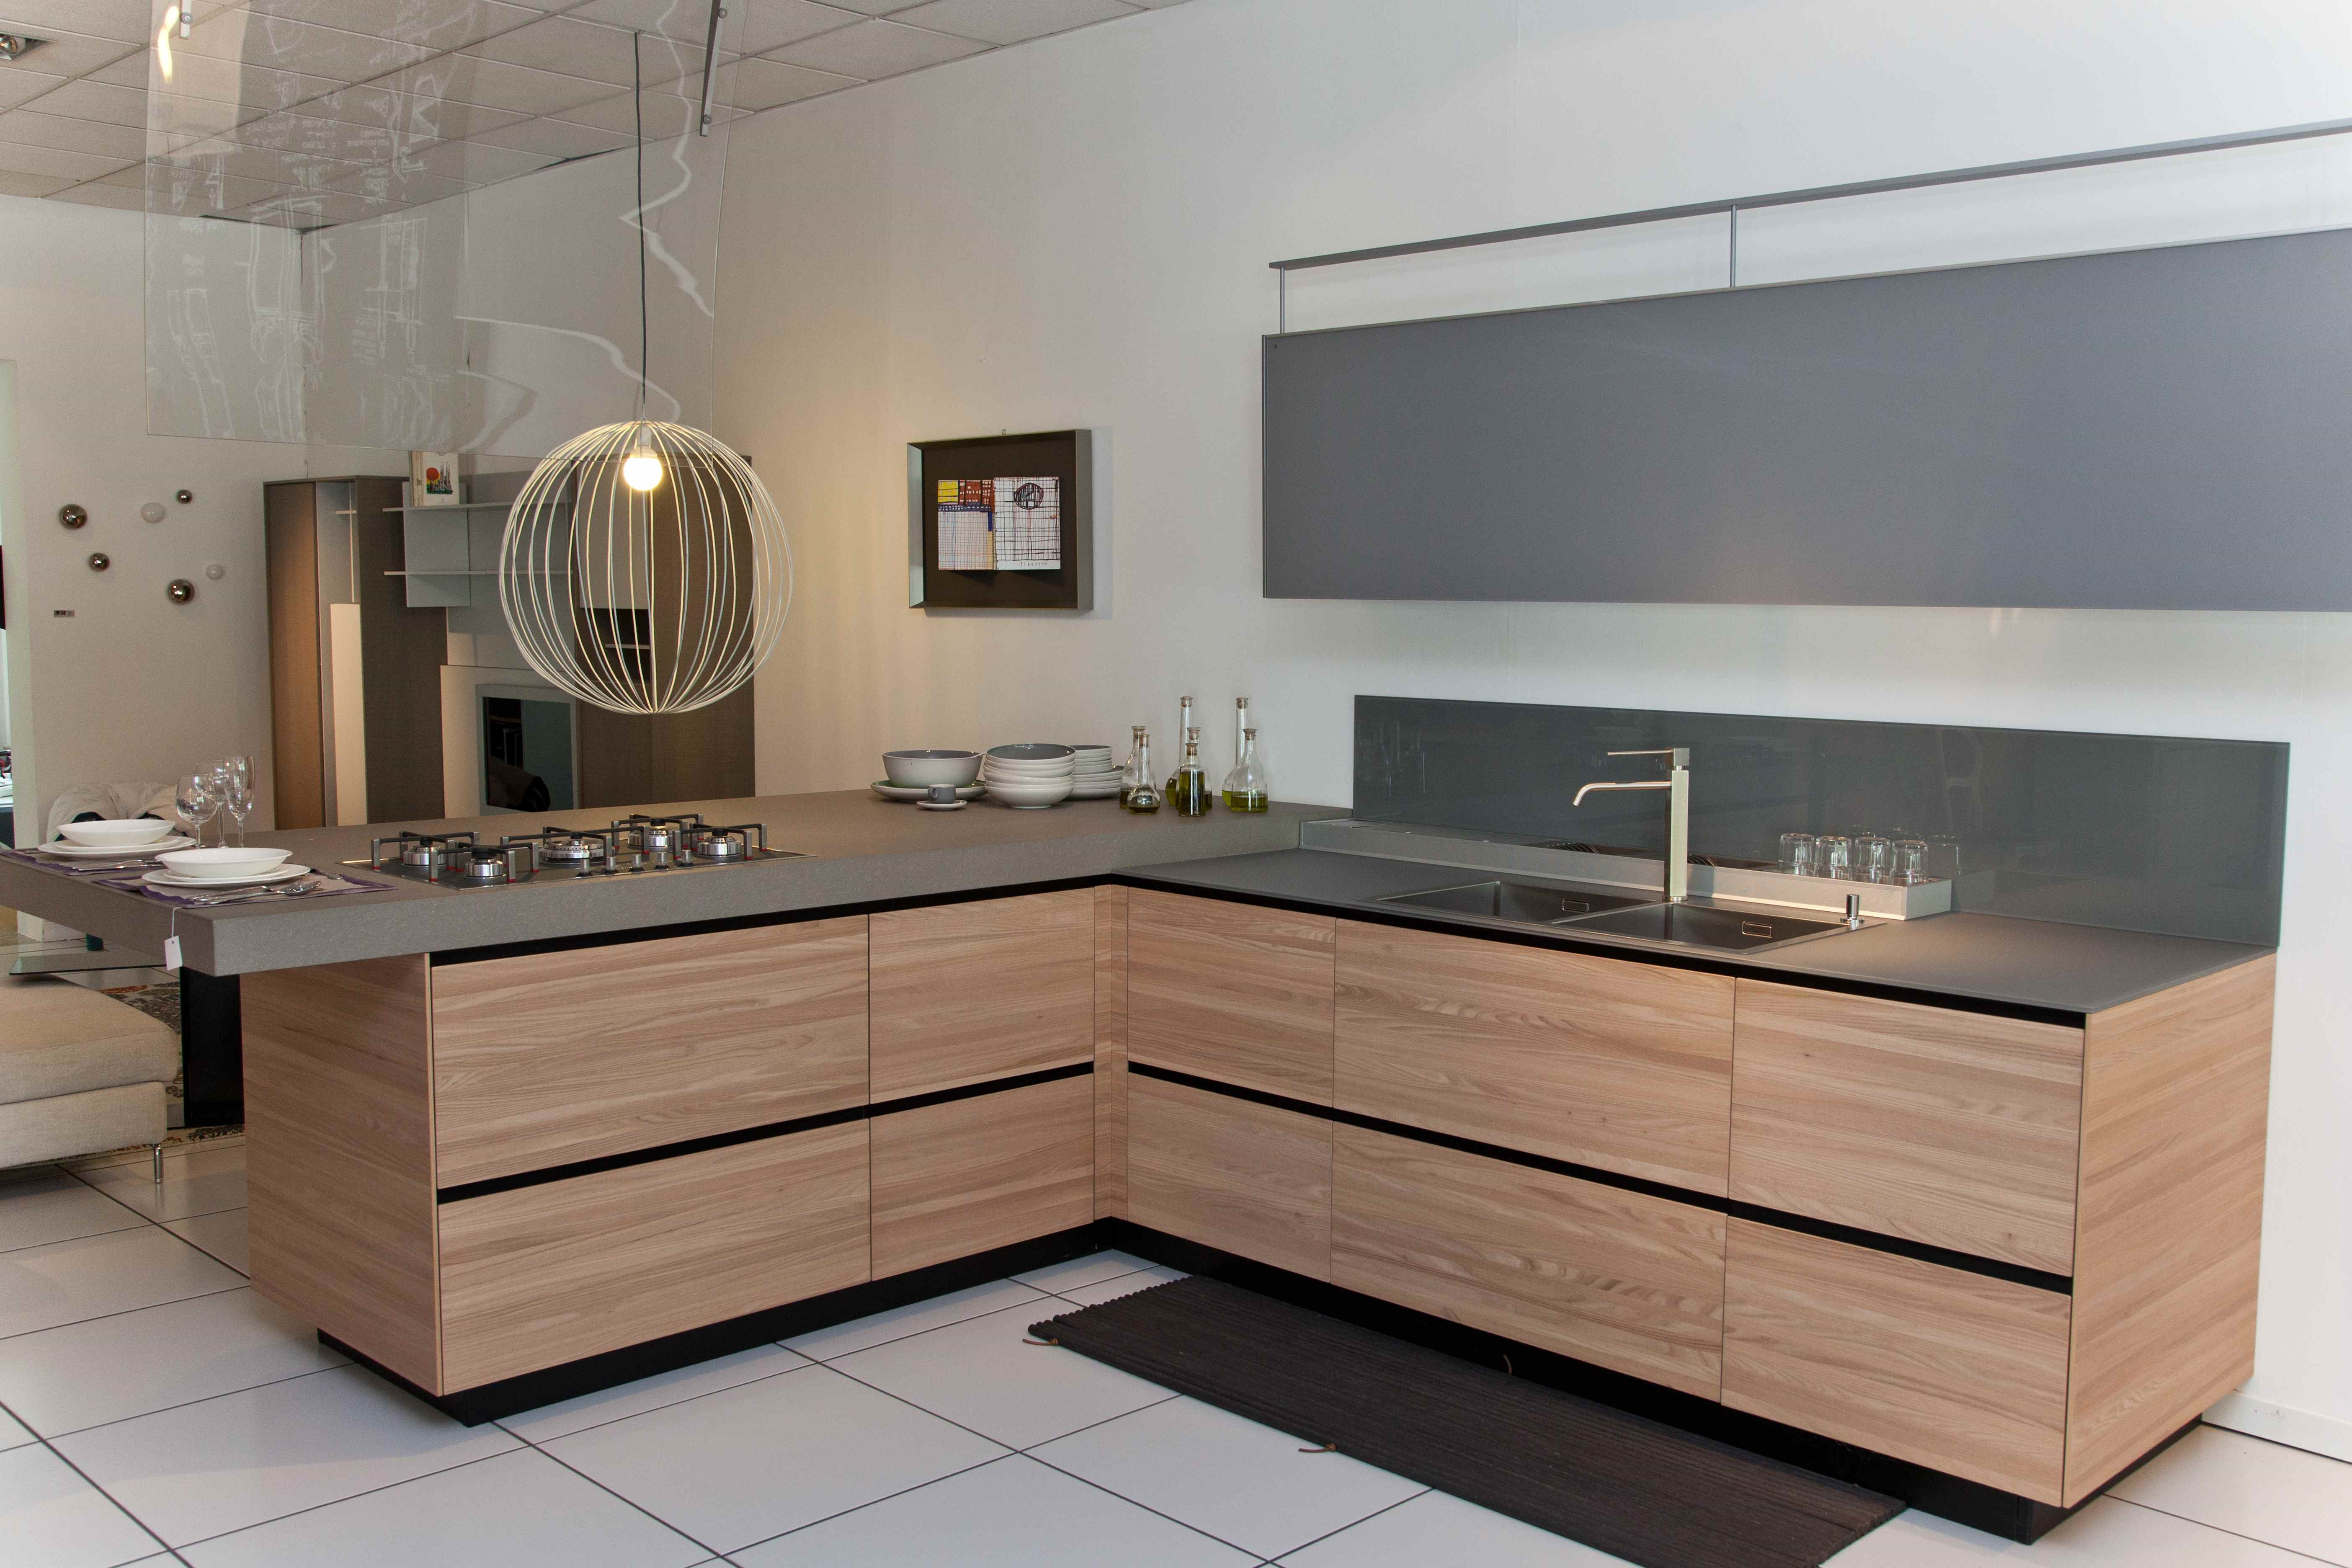 Beautiful marche di cucine moderne contemporary home - Marche di cucine italiane ...